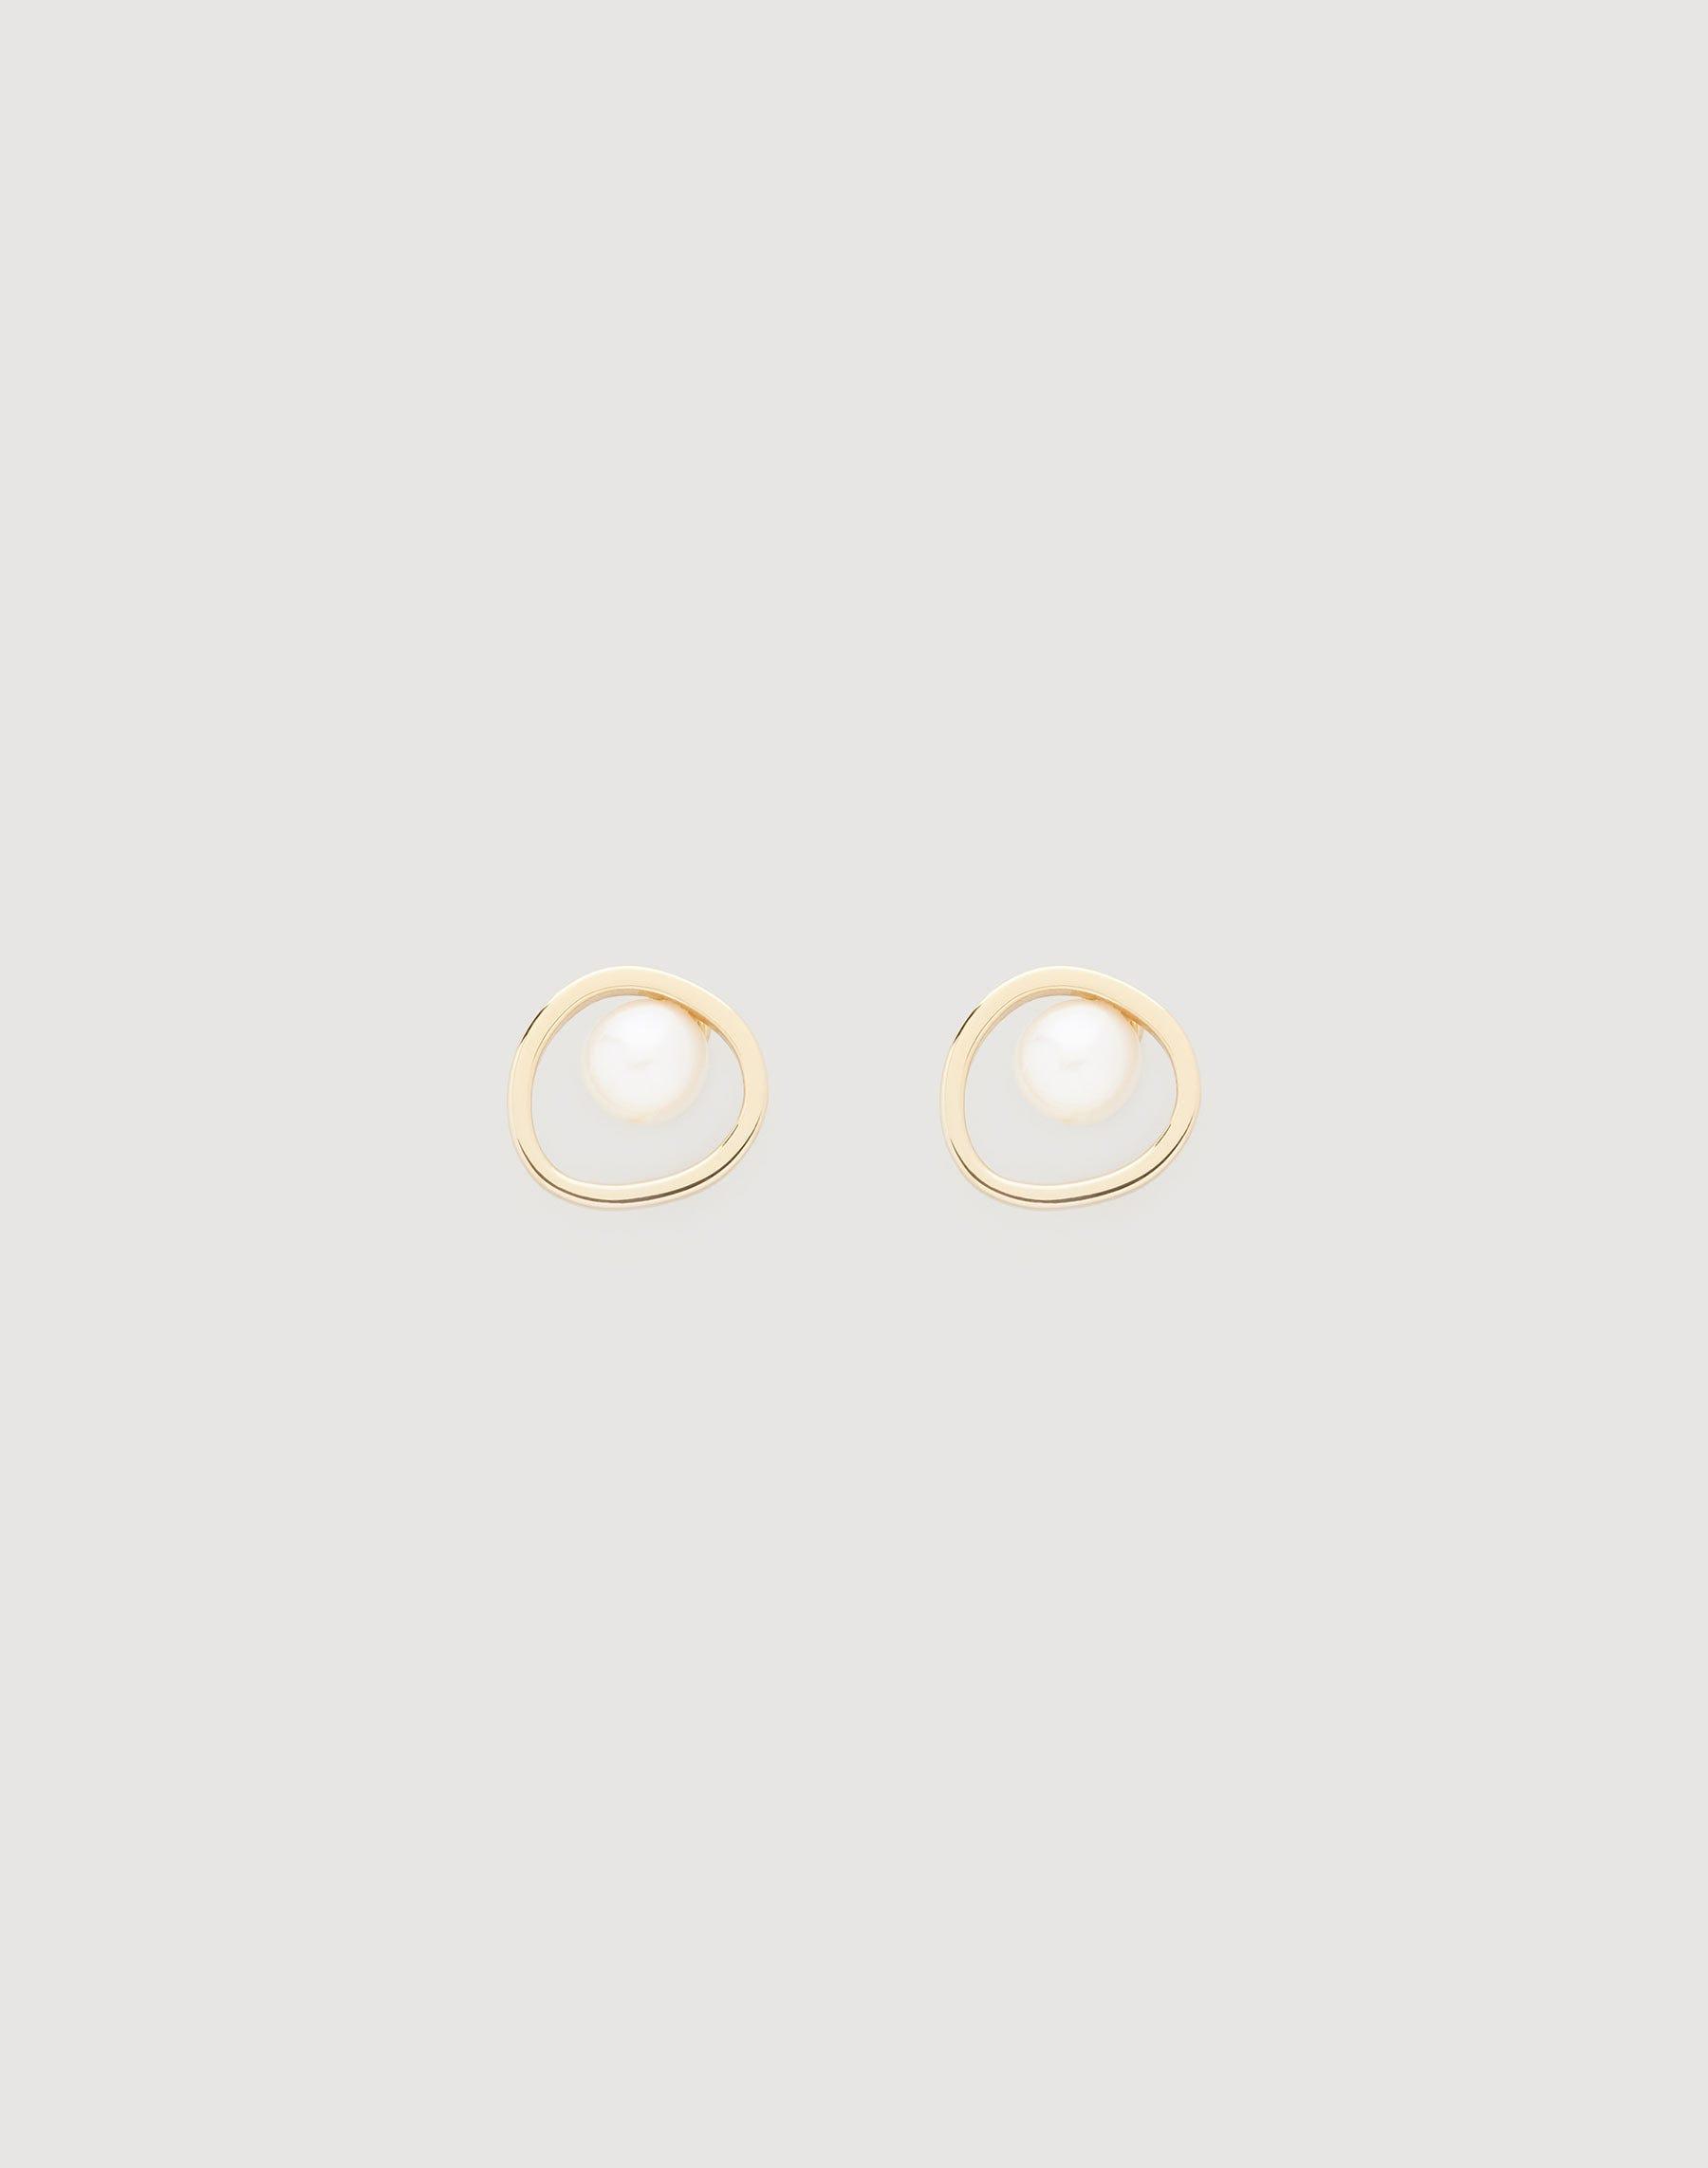 Lafayette 148 Freshwater Pearl Circle Stud Earrings In Gold